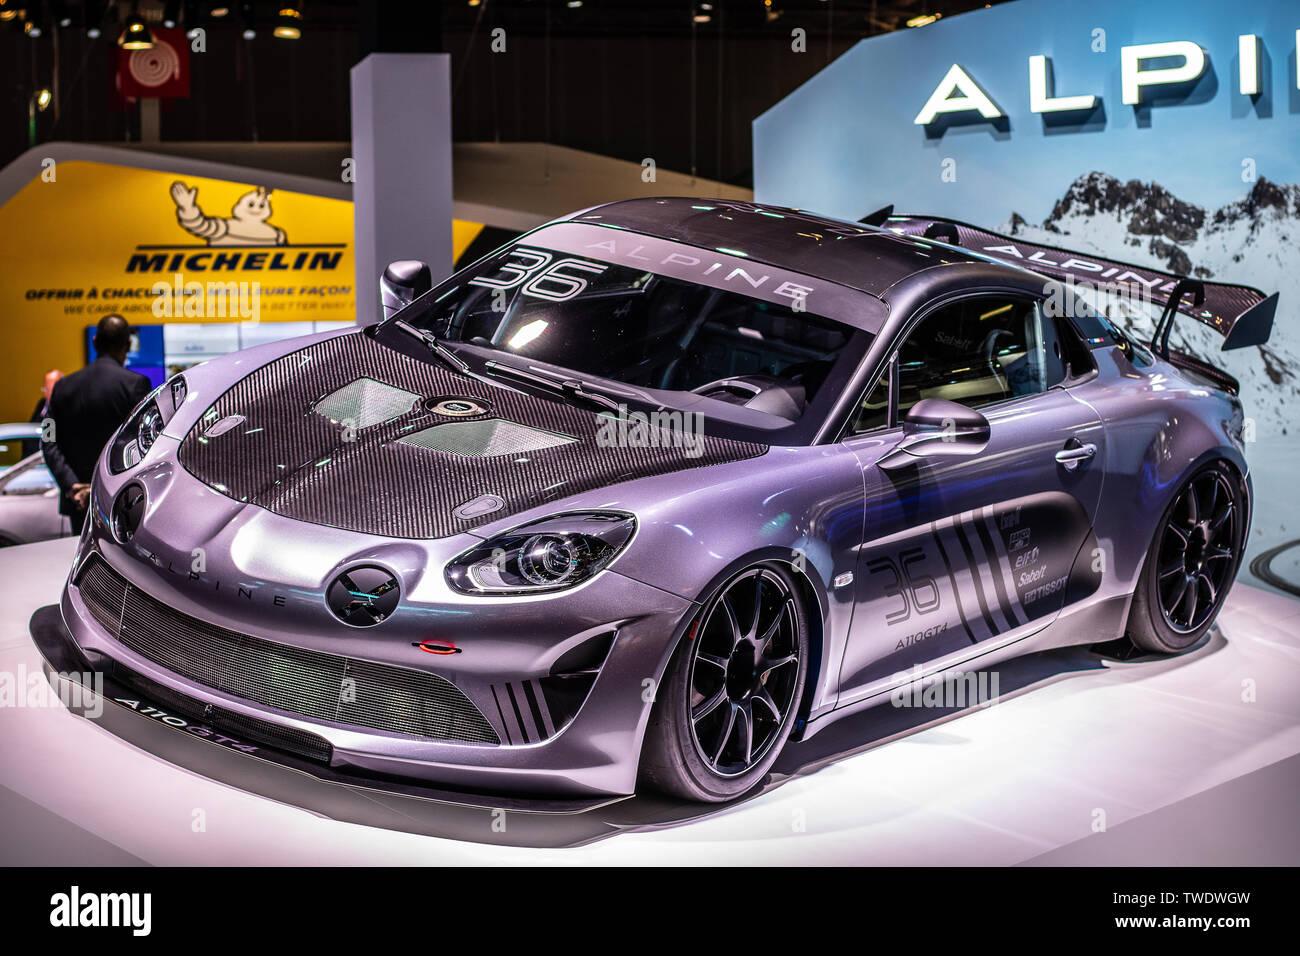 Paris, France, October 02, 2018: metallic graphite Alpine A110 GT4 sports car at Mondial Paris Motor Show, Renault's 2018 two-seater sports car - Stock Image